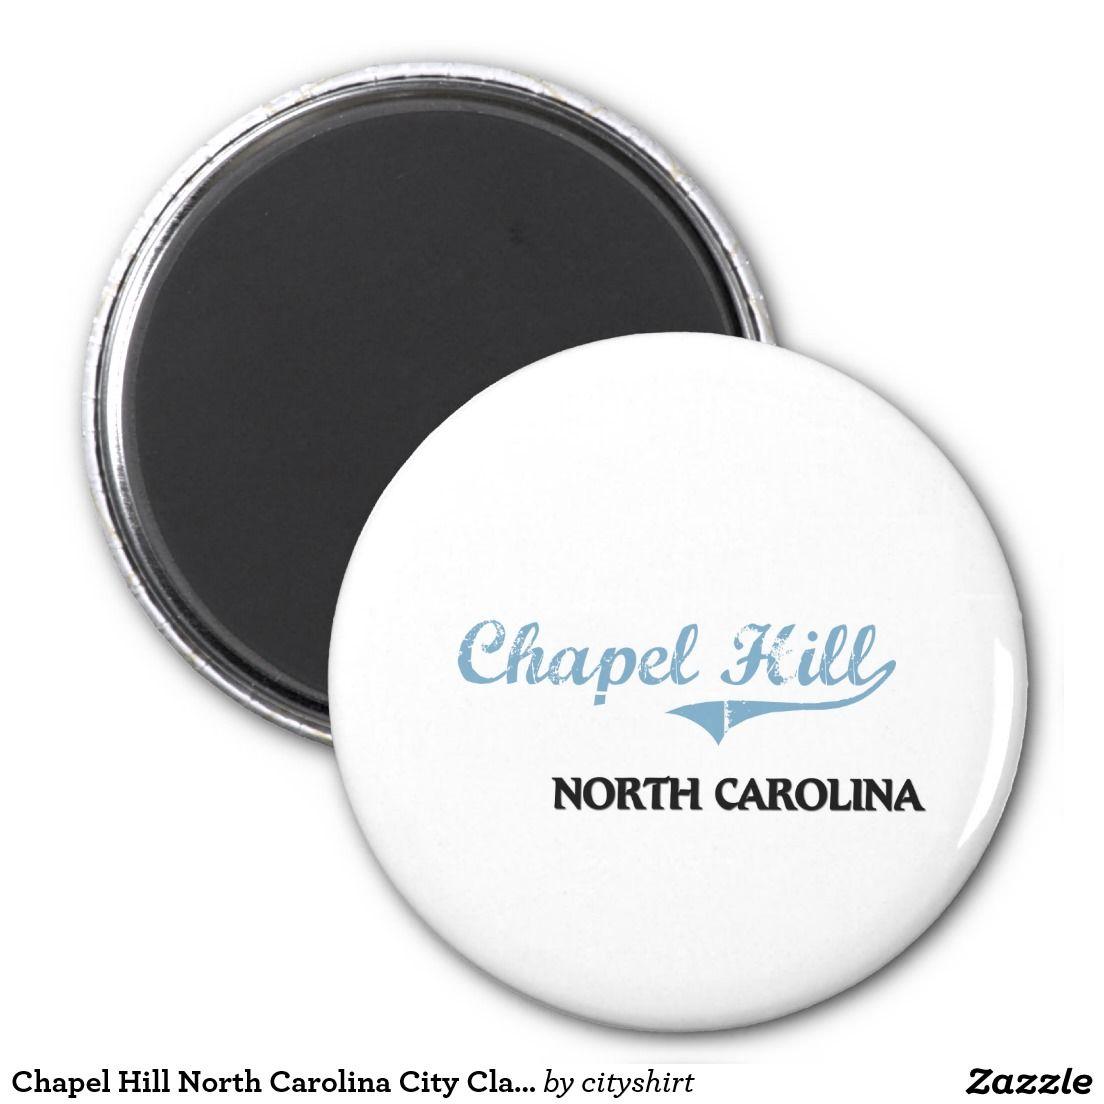 Chapel hill north carolina city classic zazzle